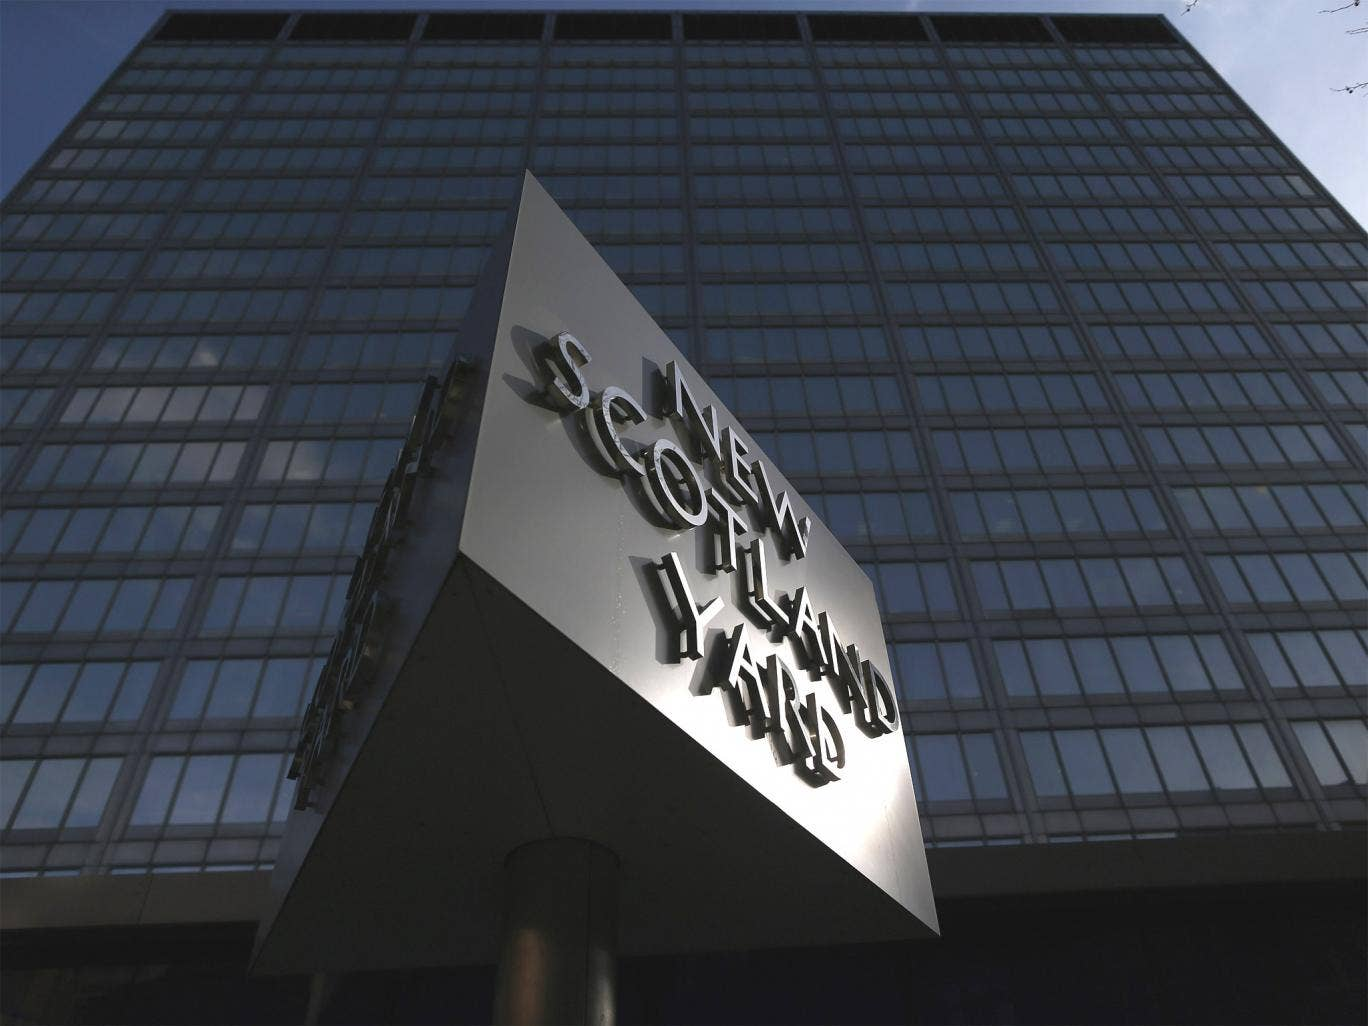 New Scotland Yard, the headquarters of the Metropolitan Police